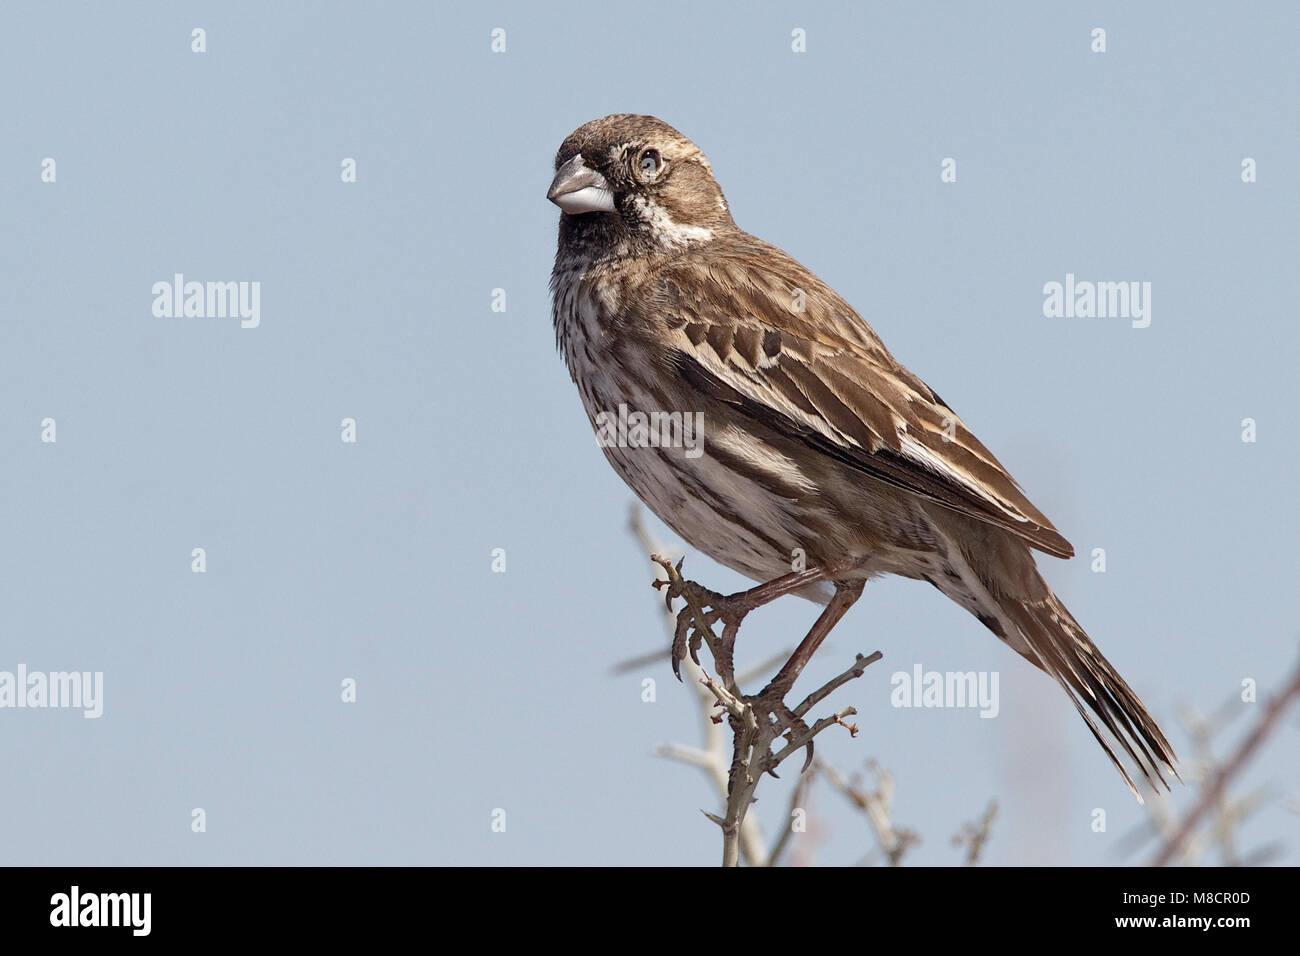 Adult male non-breeding Jeff Davis Co., TX March 2010 - Stock Image